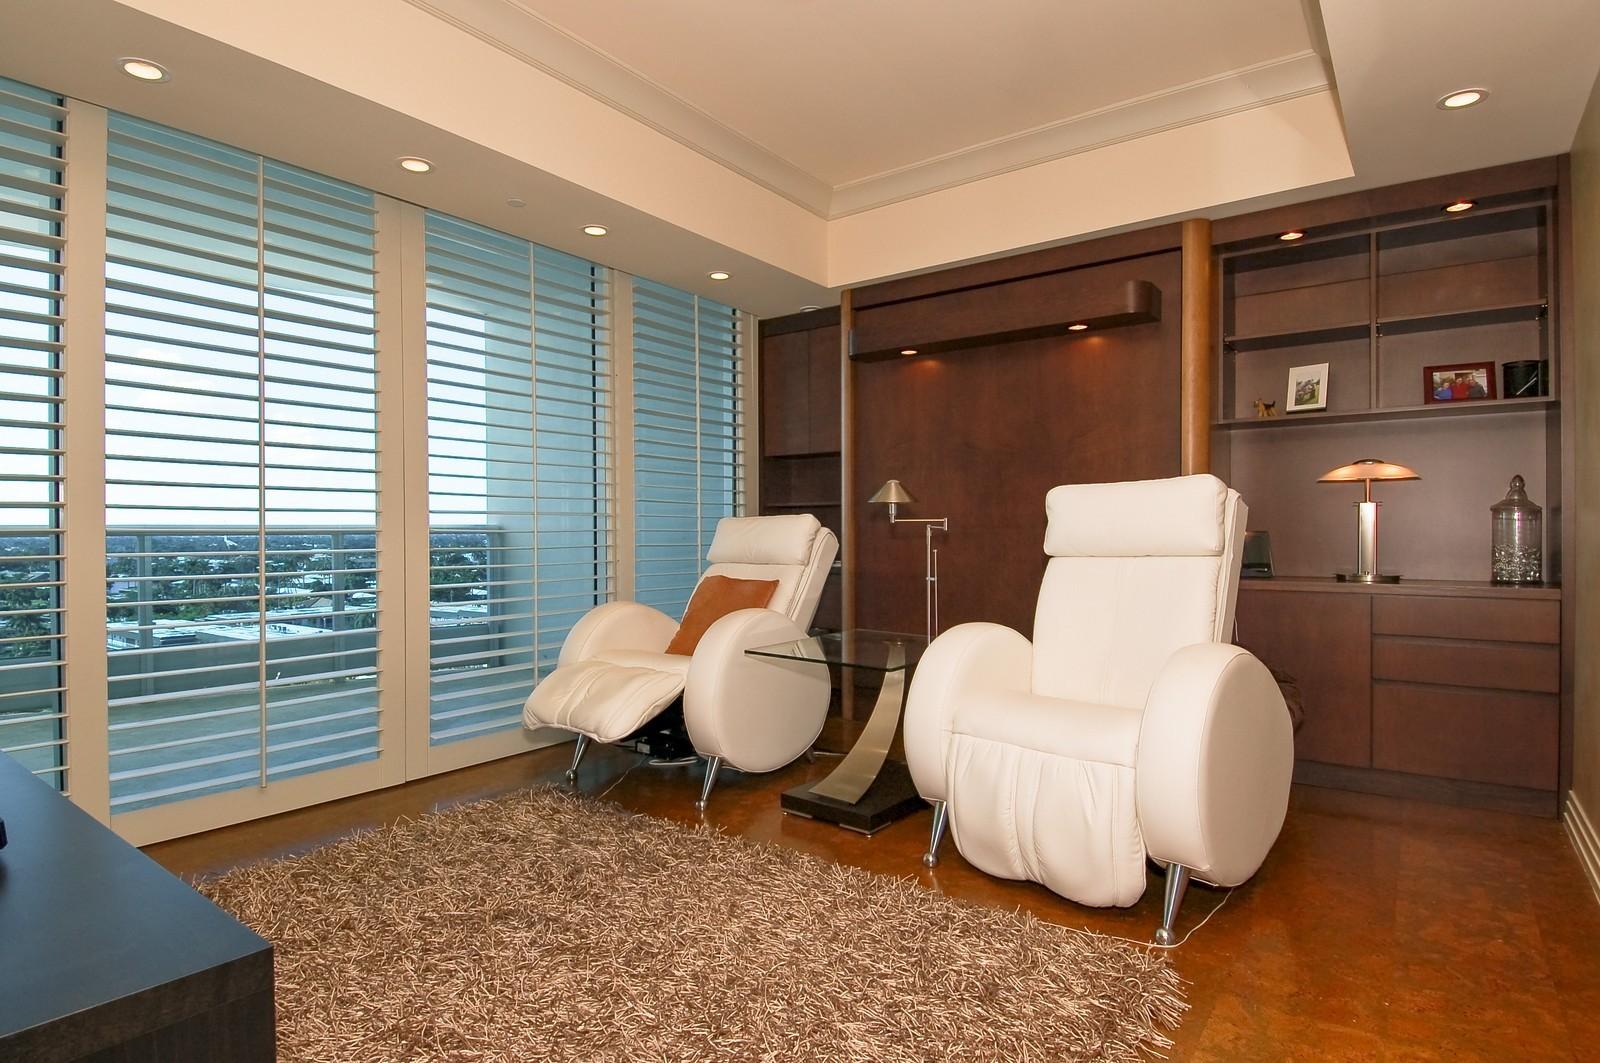 Real Estate Photography - 1600 S Ocean Blvd, Apt 802, Pompano Beach, FL, 33062 - 2nd Bedroom